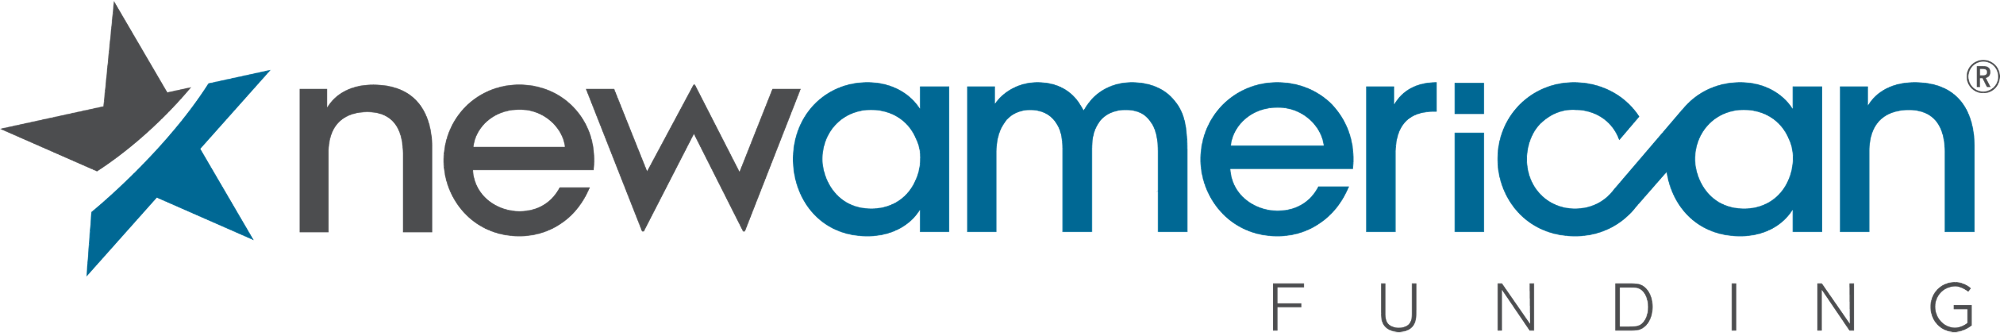 newamericanfunding-logo